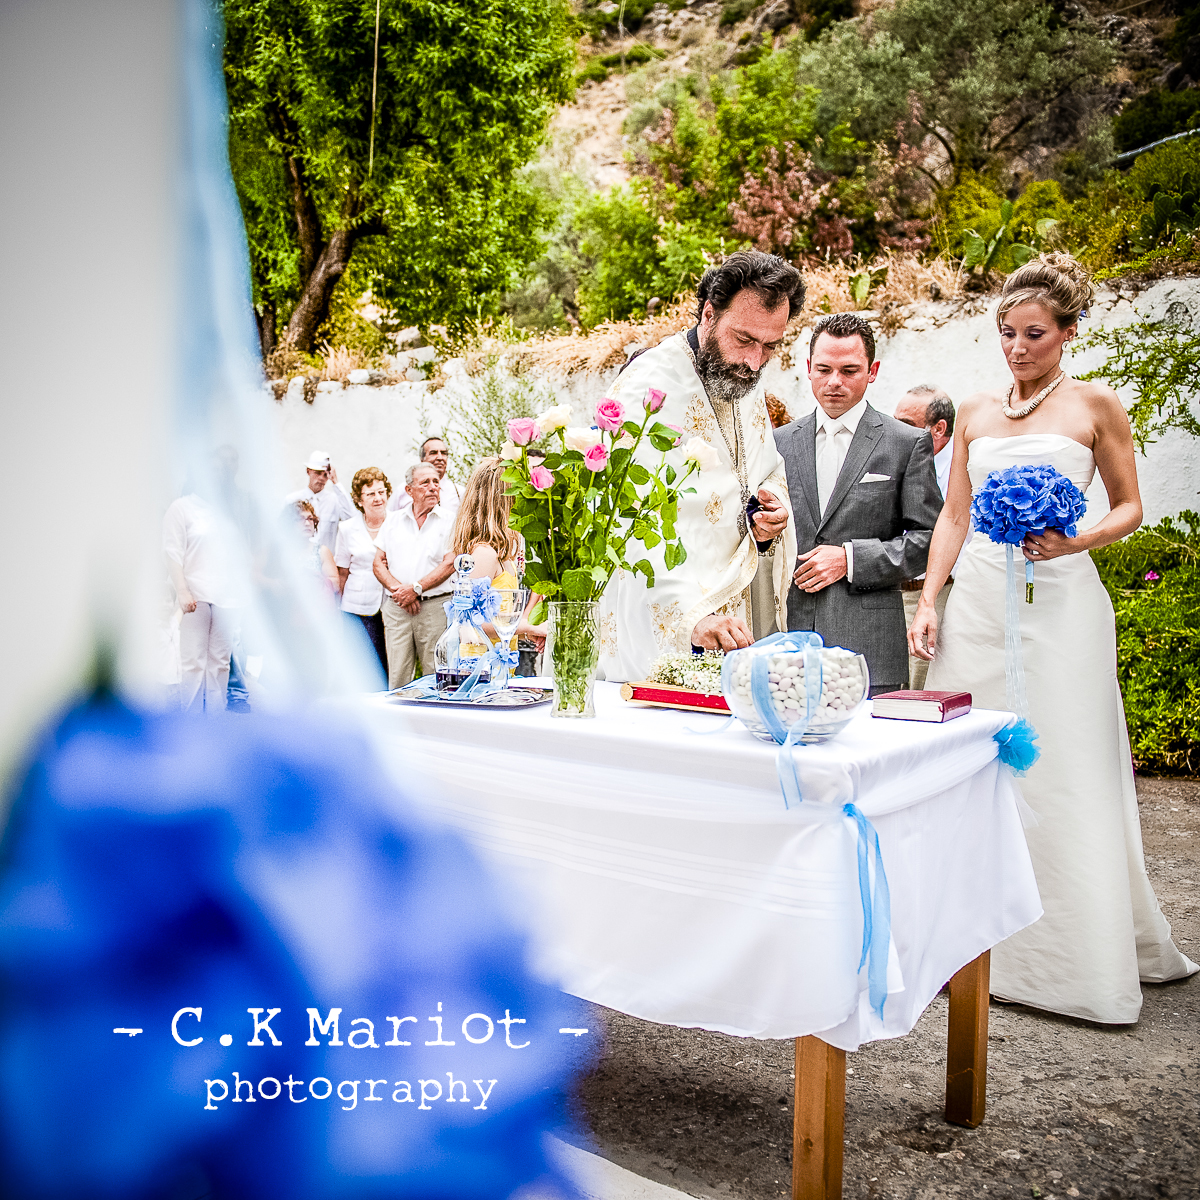 CK-Mariot-Photography-mariage- orthodoxe-crète-0277